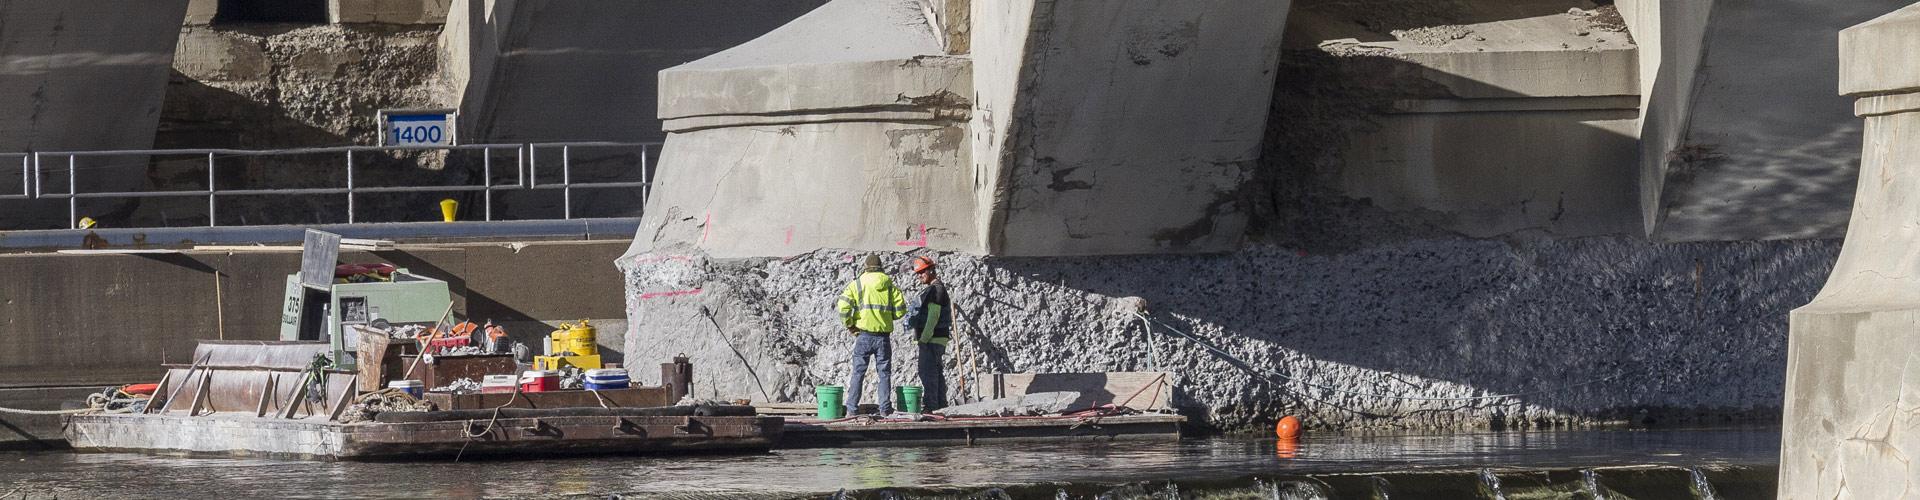 bridge pier repair, bridge abutment repair, underwater pier repairs, marine construction, st. paul marine construction, underwater concrete repairs